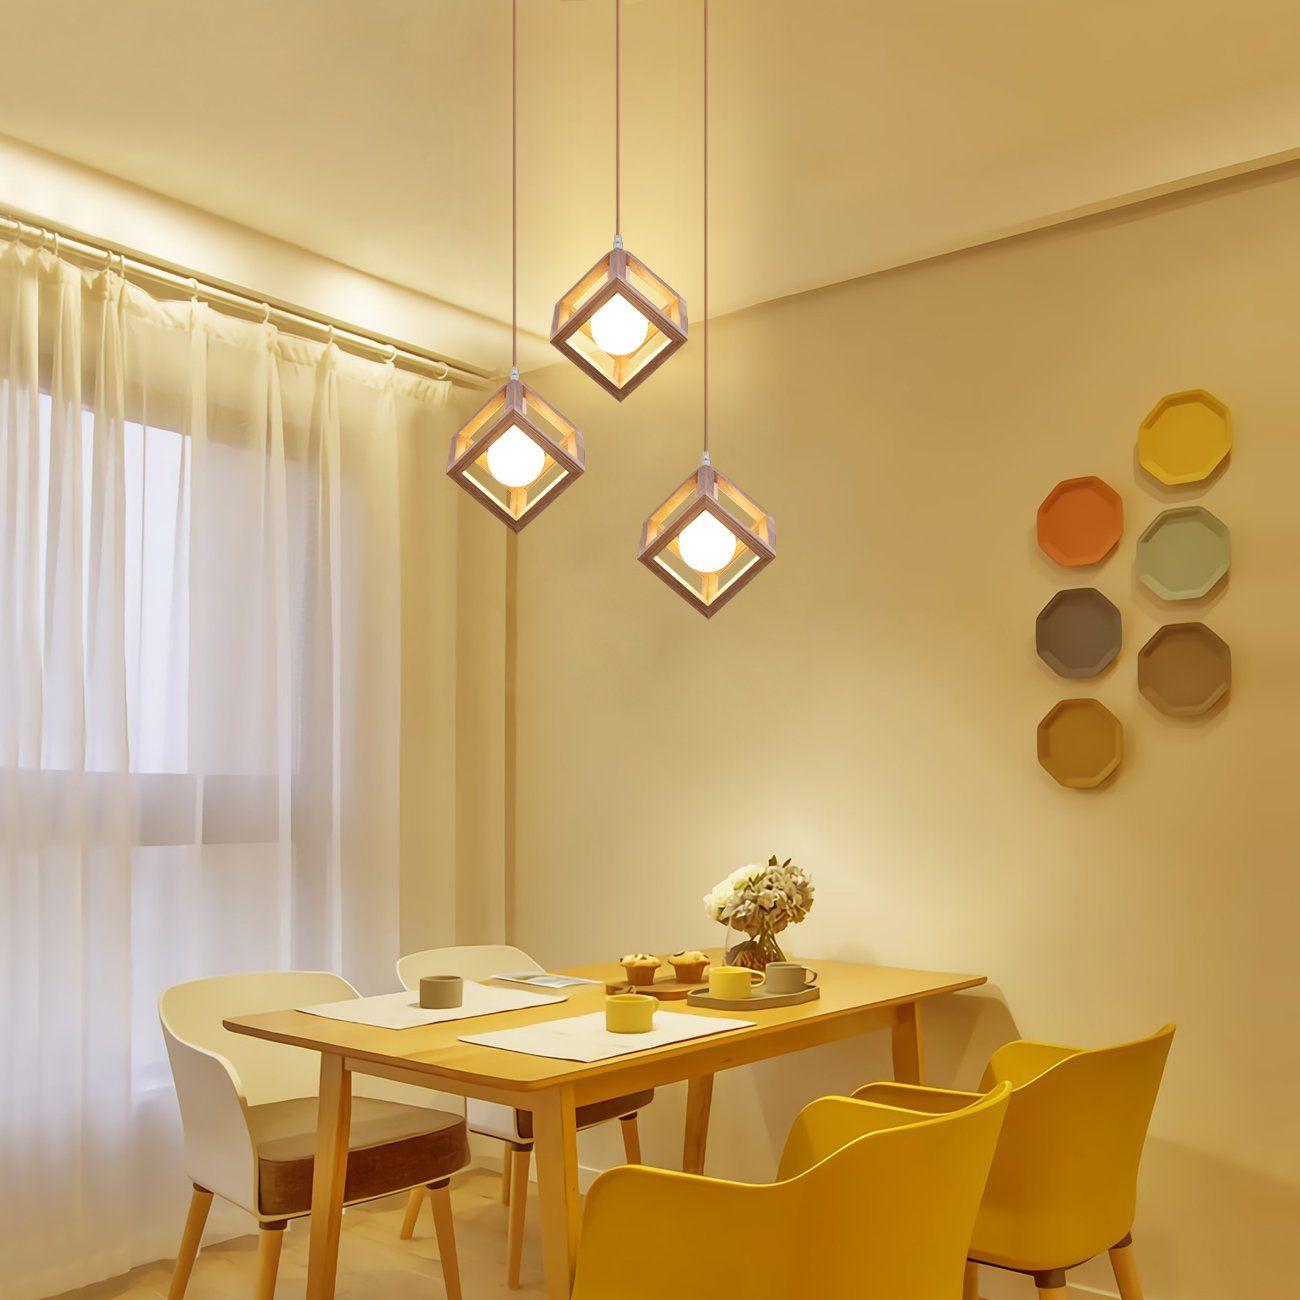 Mingdaxin Woodiness Pendant Lightcontemporary Diy Hanging Lamp Hangs Illumeadjust Suspension Height Ceiling Li Ceiling Lights Dining Room Lighting Wooden Light